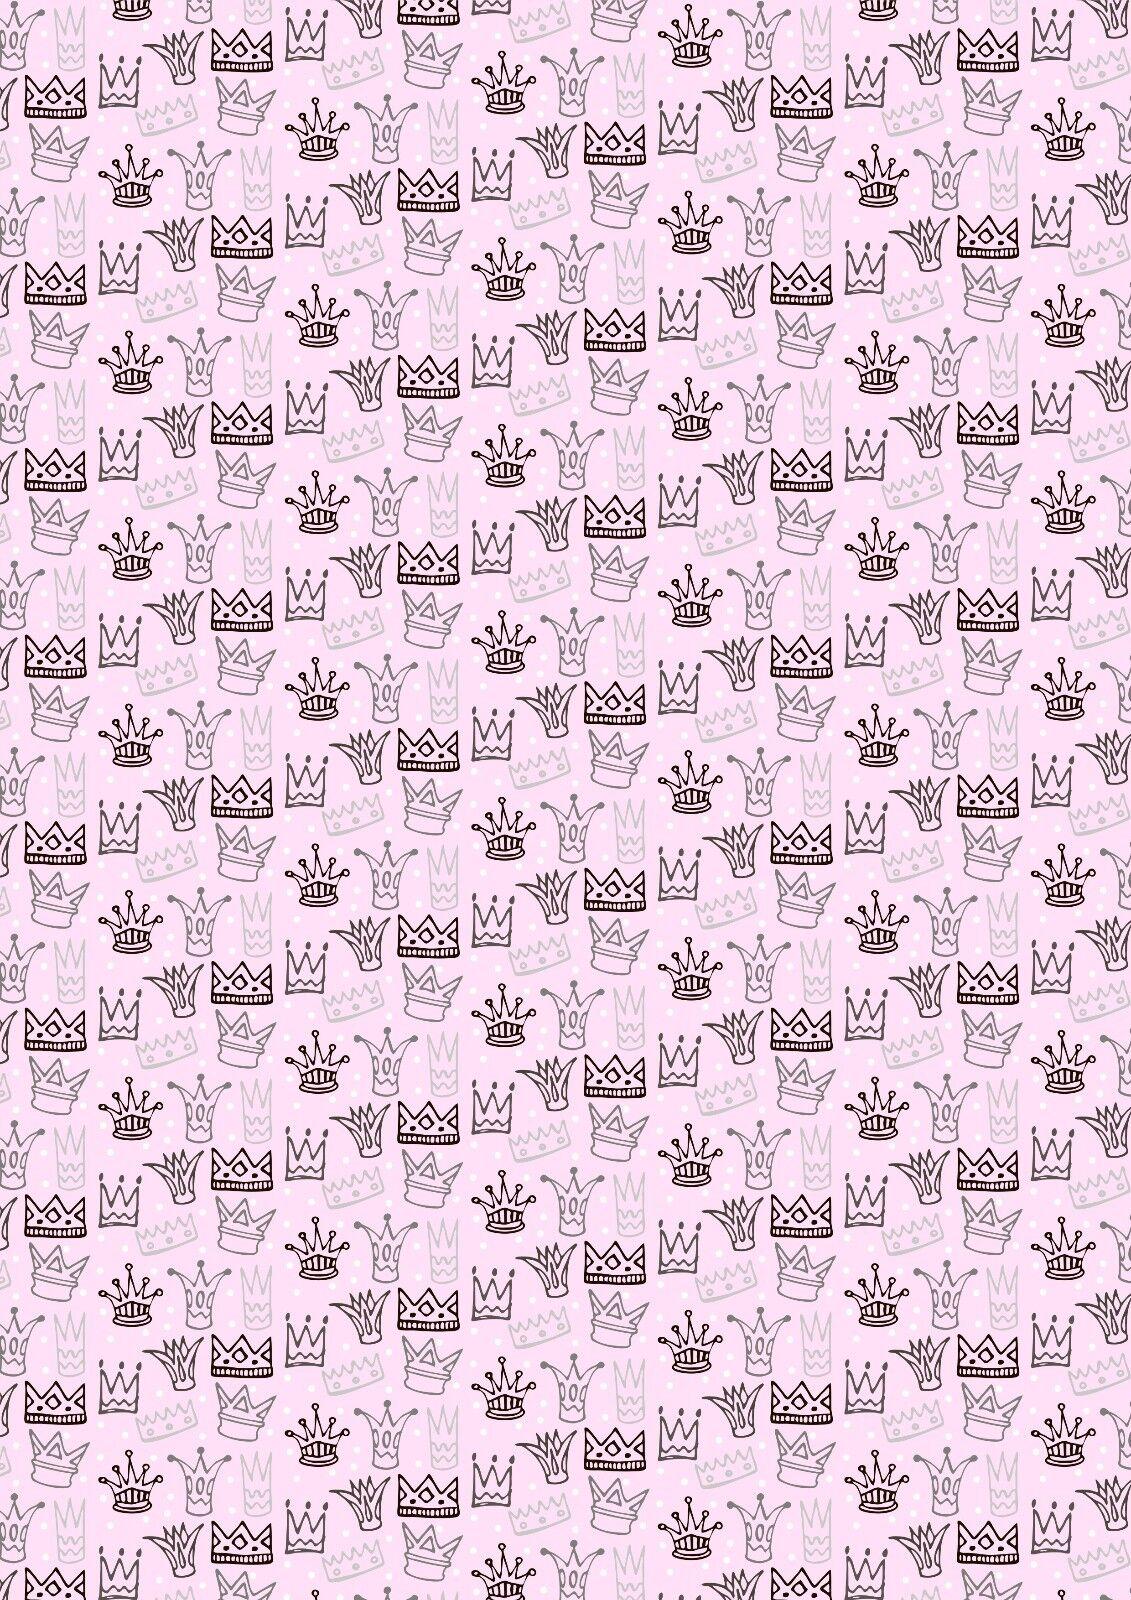 Printed Bow Fabric A4 Canvas Pandas Stars on Pink PA1 Make glitter bows